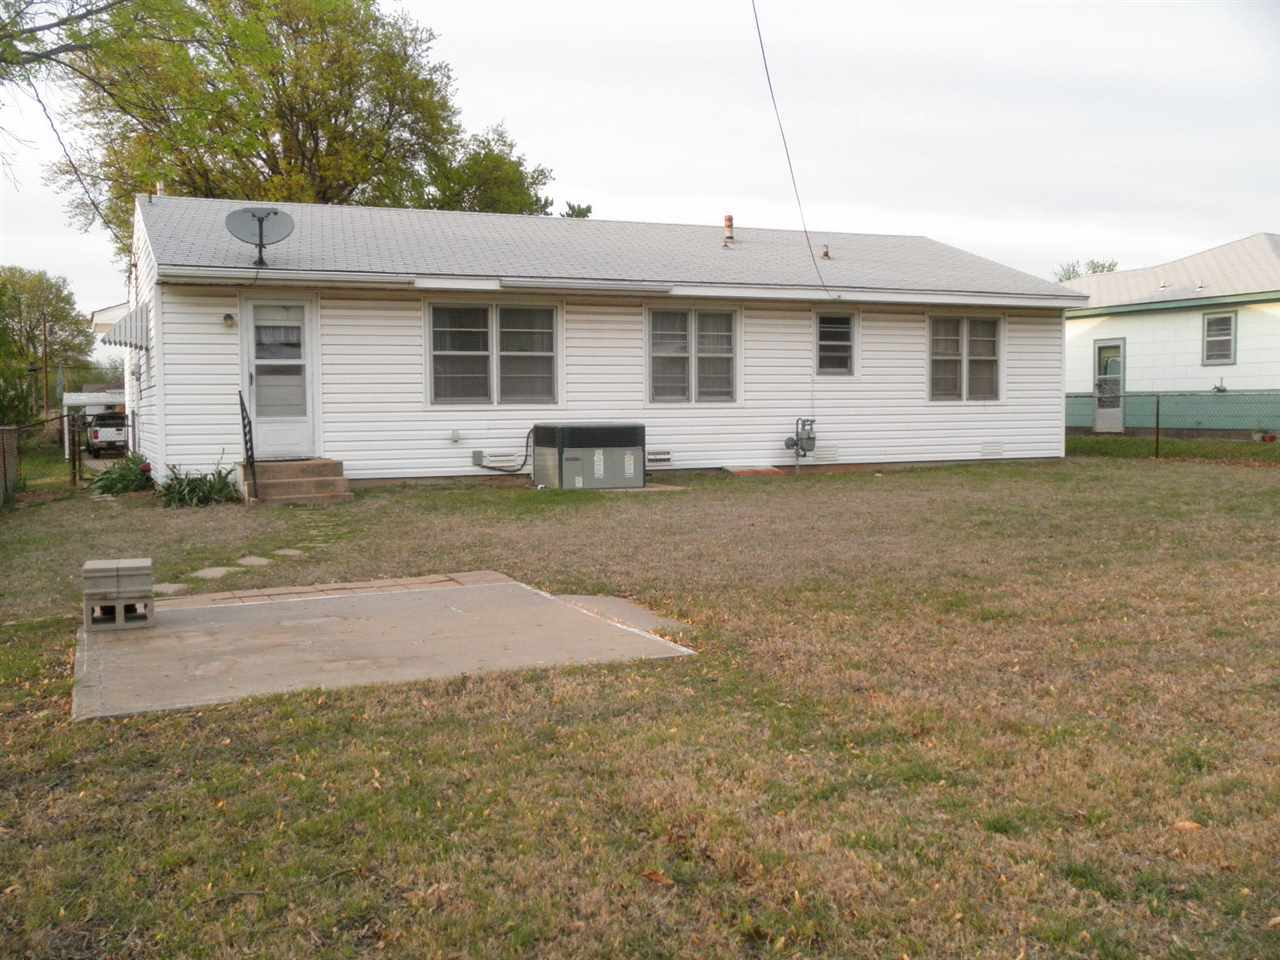 Sold Cross Sale W/ MLS | 508 Glendale  Ponca City, OK 74601 18